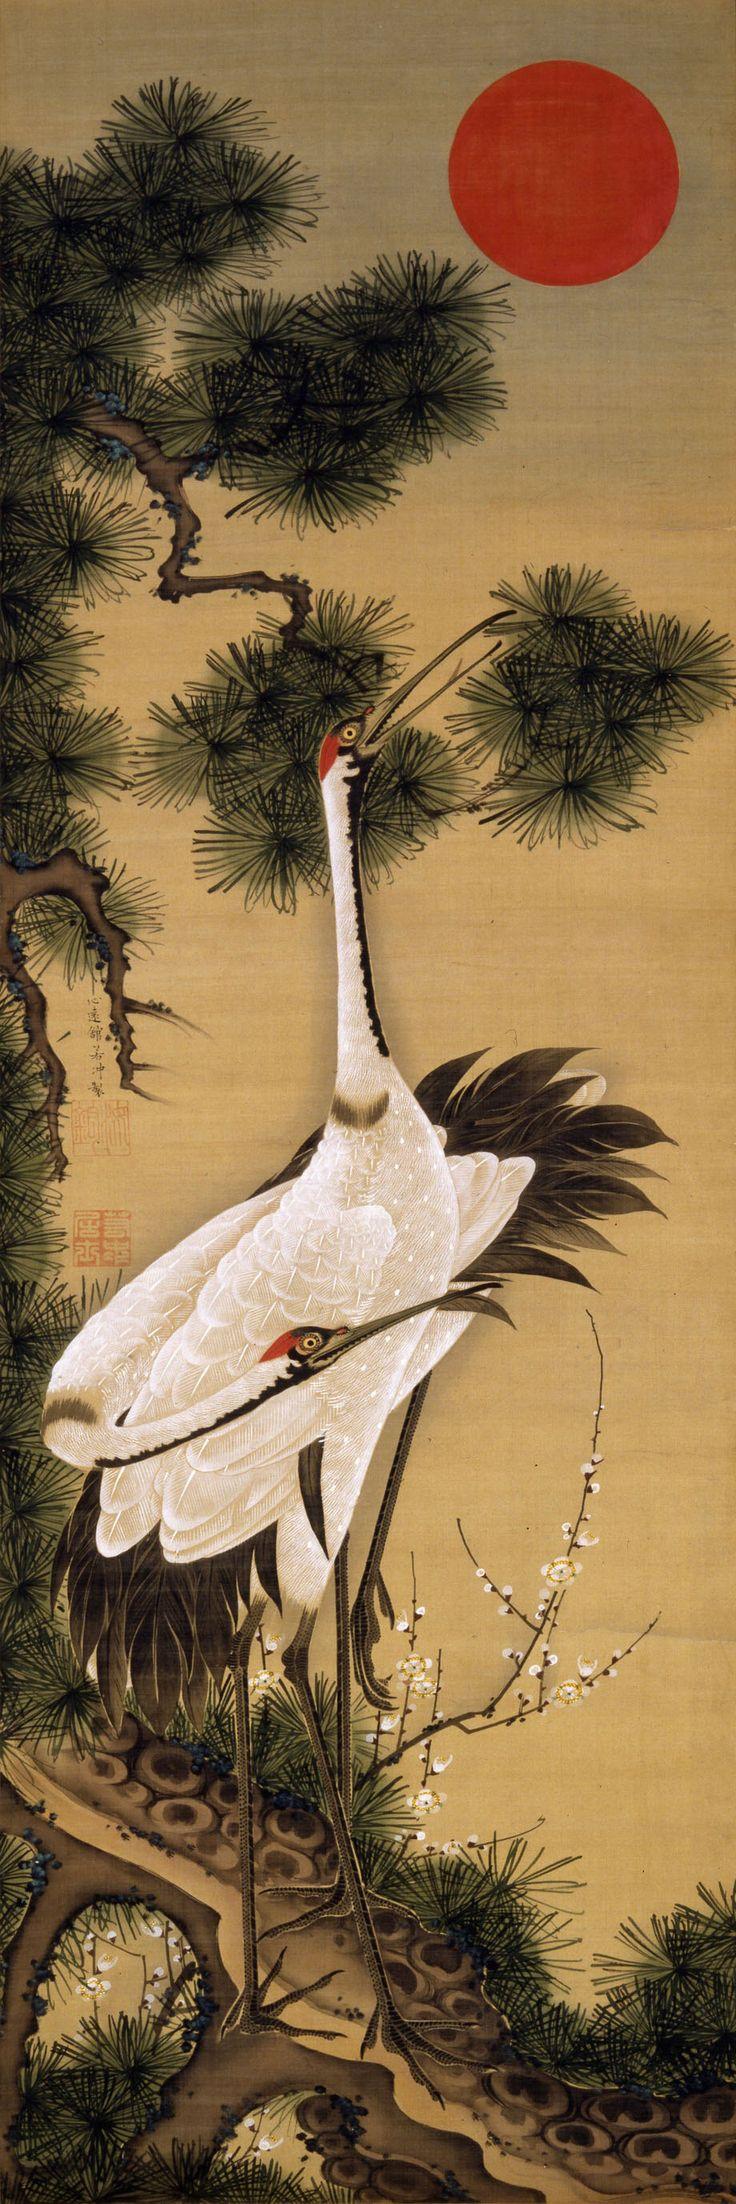 """Pair of cranes and the morning sun"" by Jakuchu ITO (1716-1800), Japan 伊藤若冲"